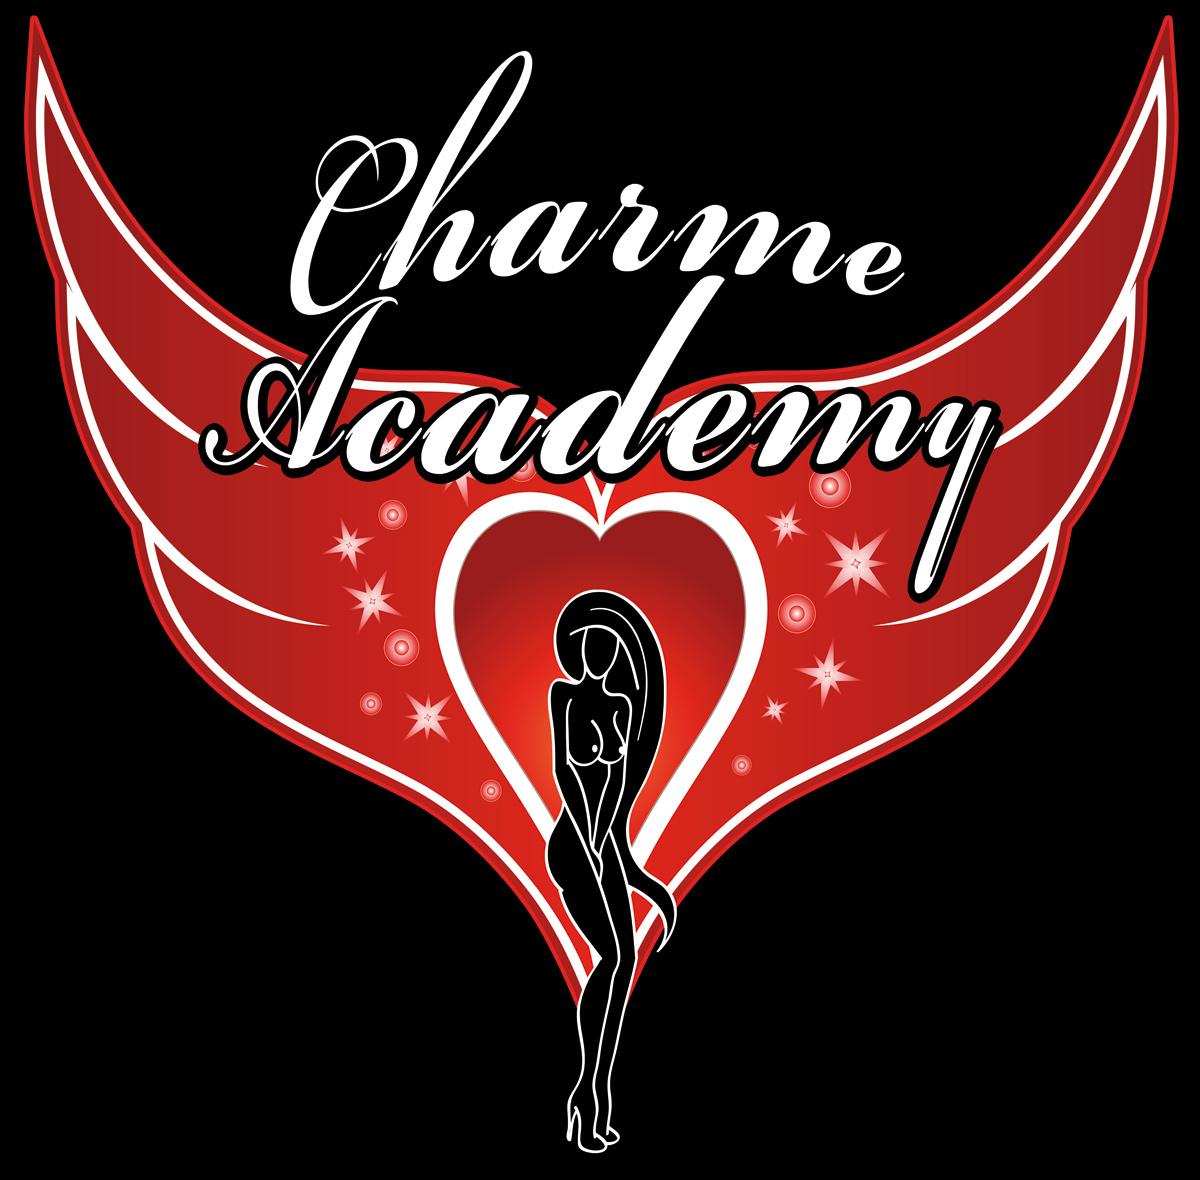 Charme Academy